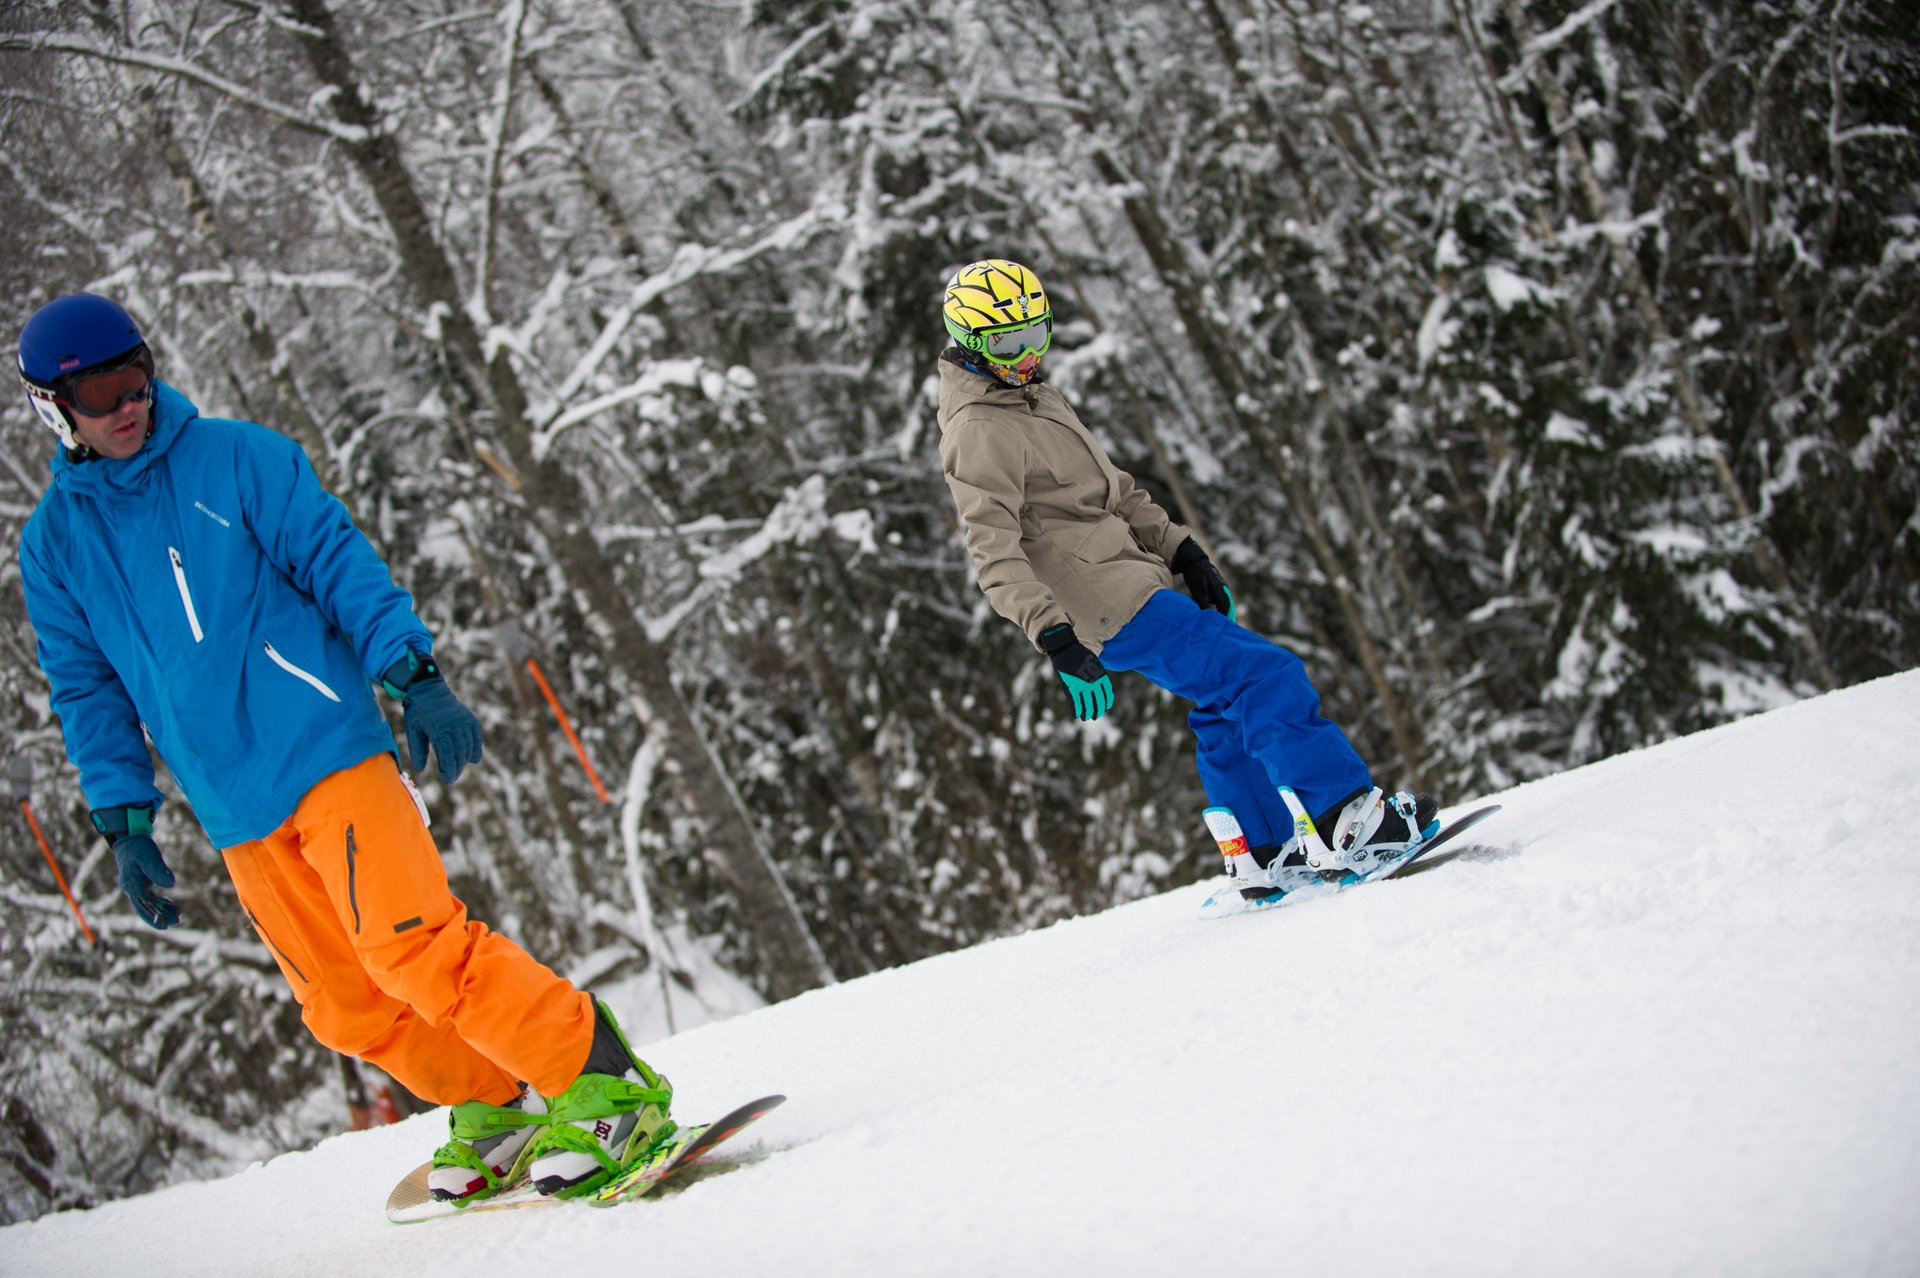 Skiing and Snowboarding in Estonia - Best Season 2020